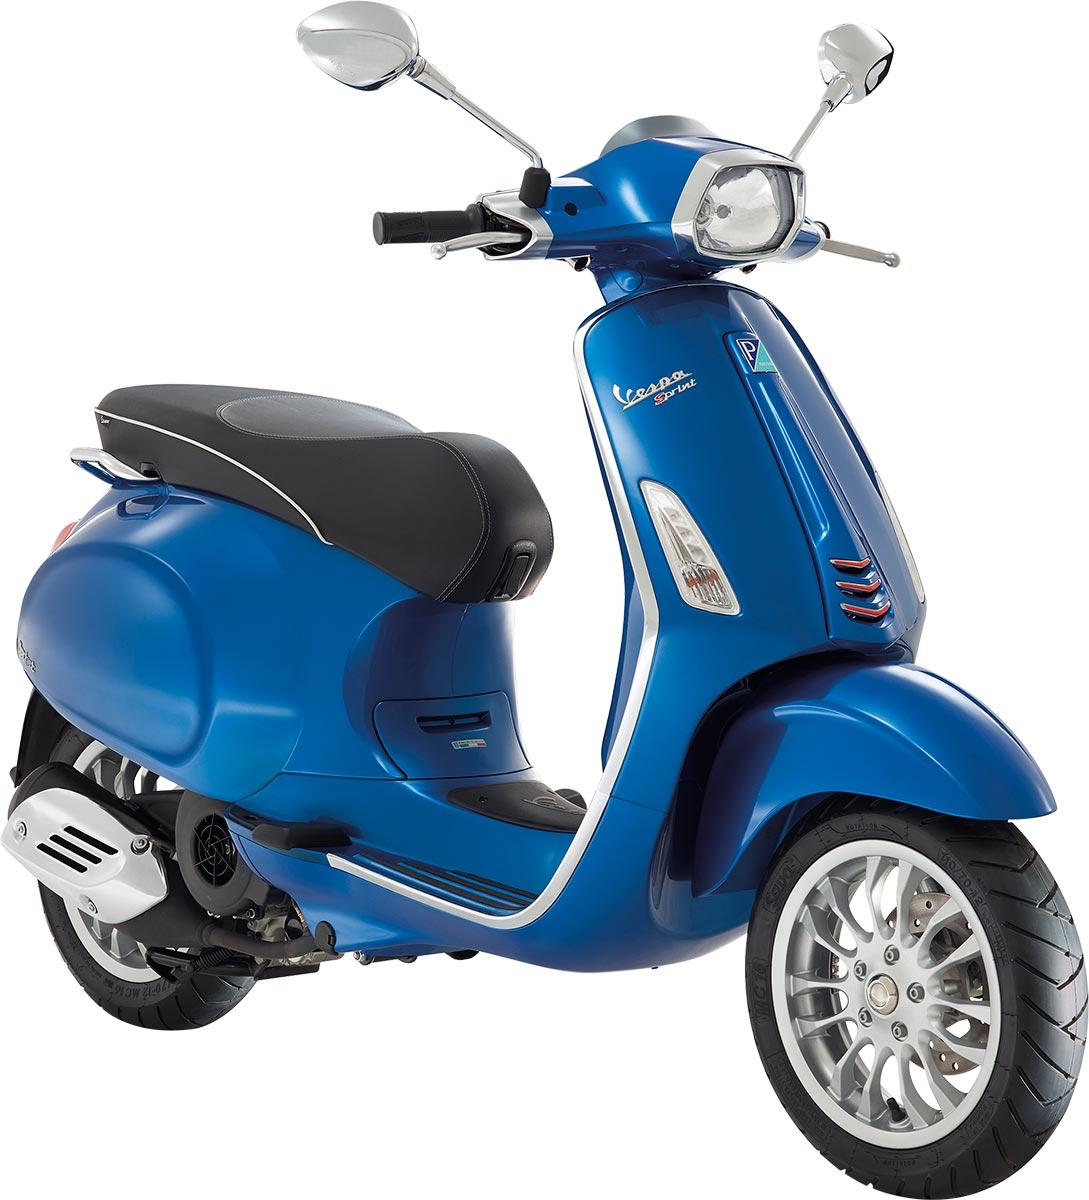 scooter-vespa-sprint-125-2014-static.jpg